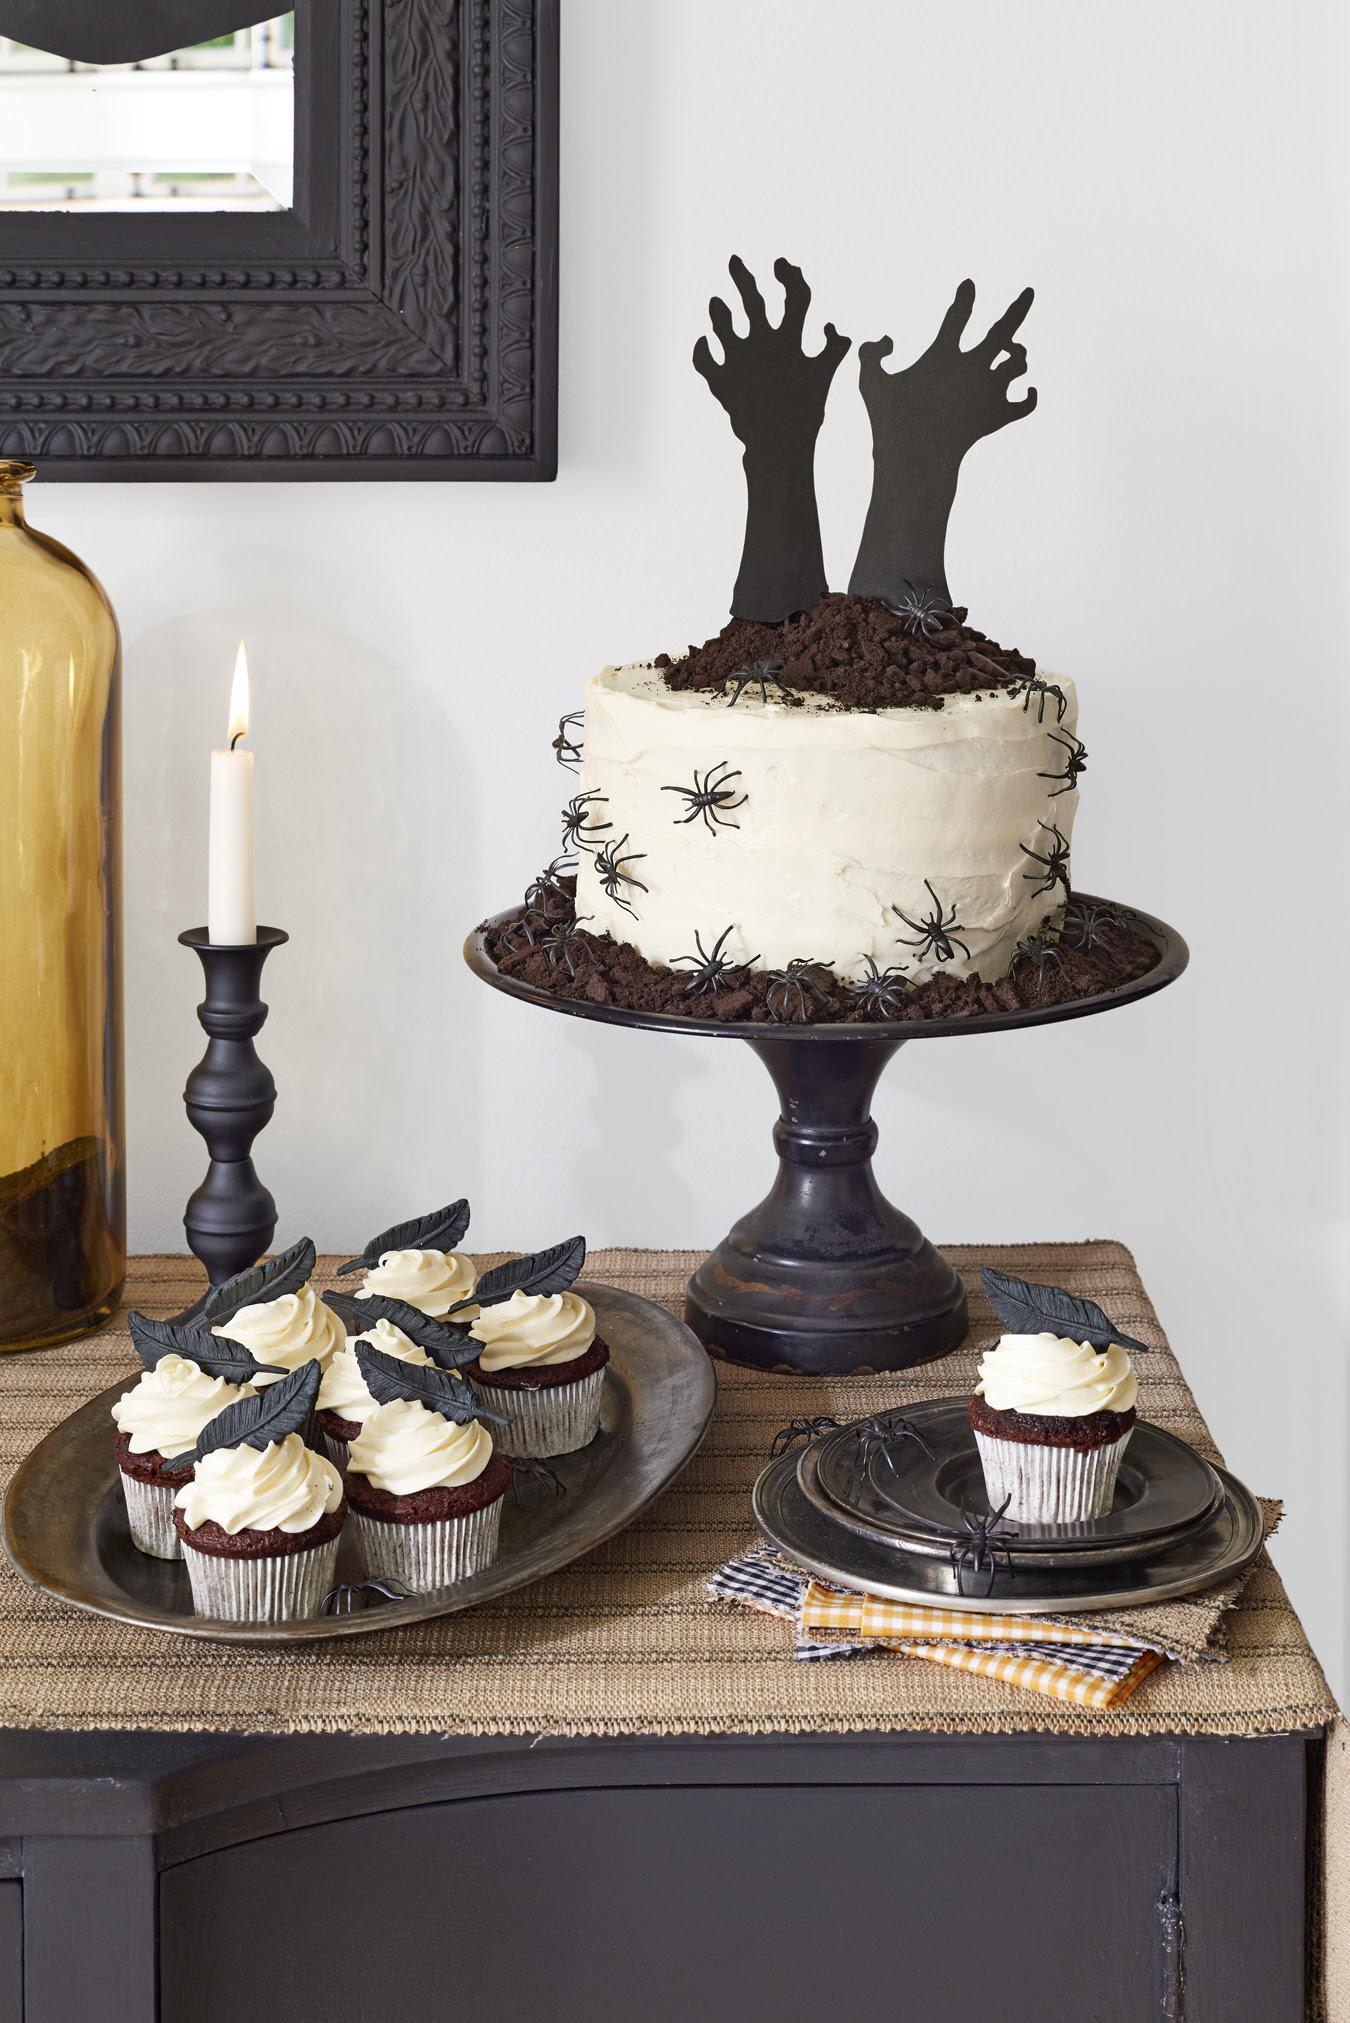 55 Easy Halloween Cakes - Recipes and Halloween Cake ...